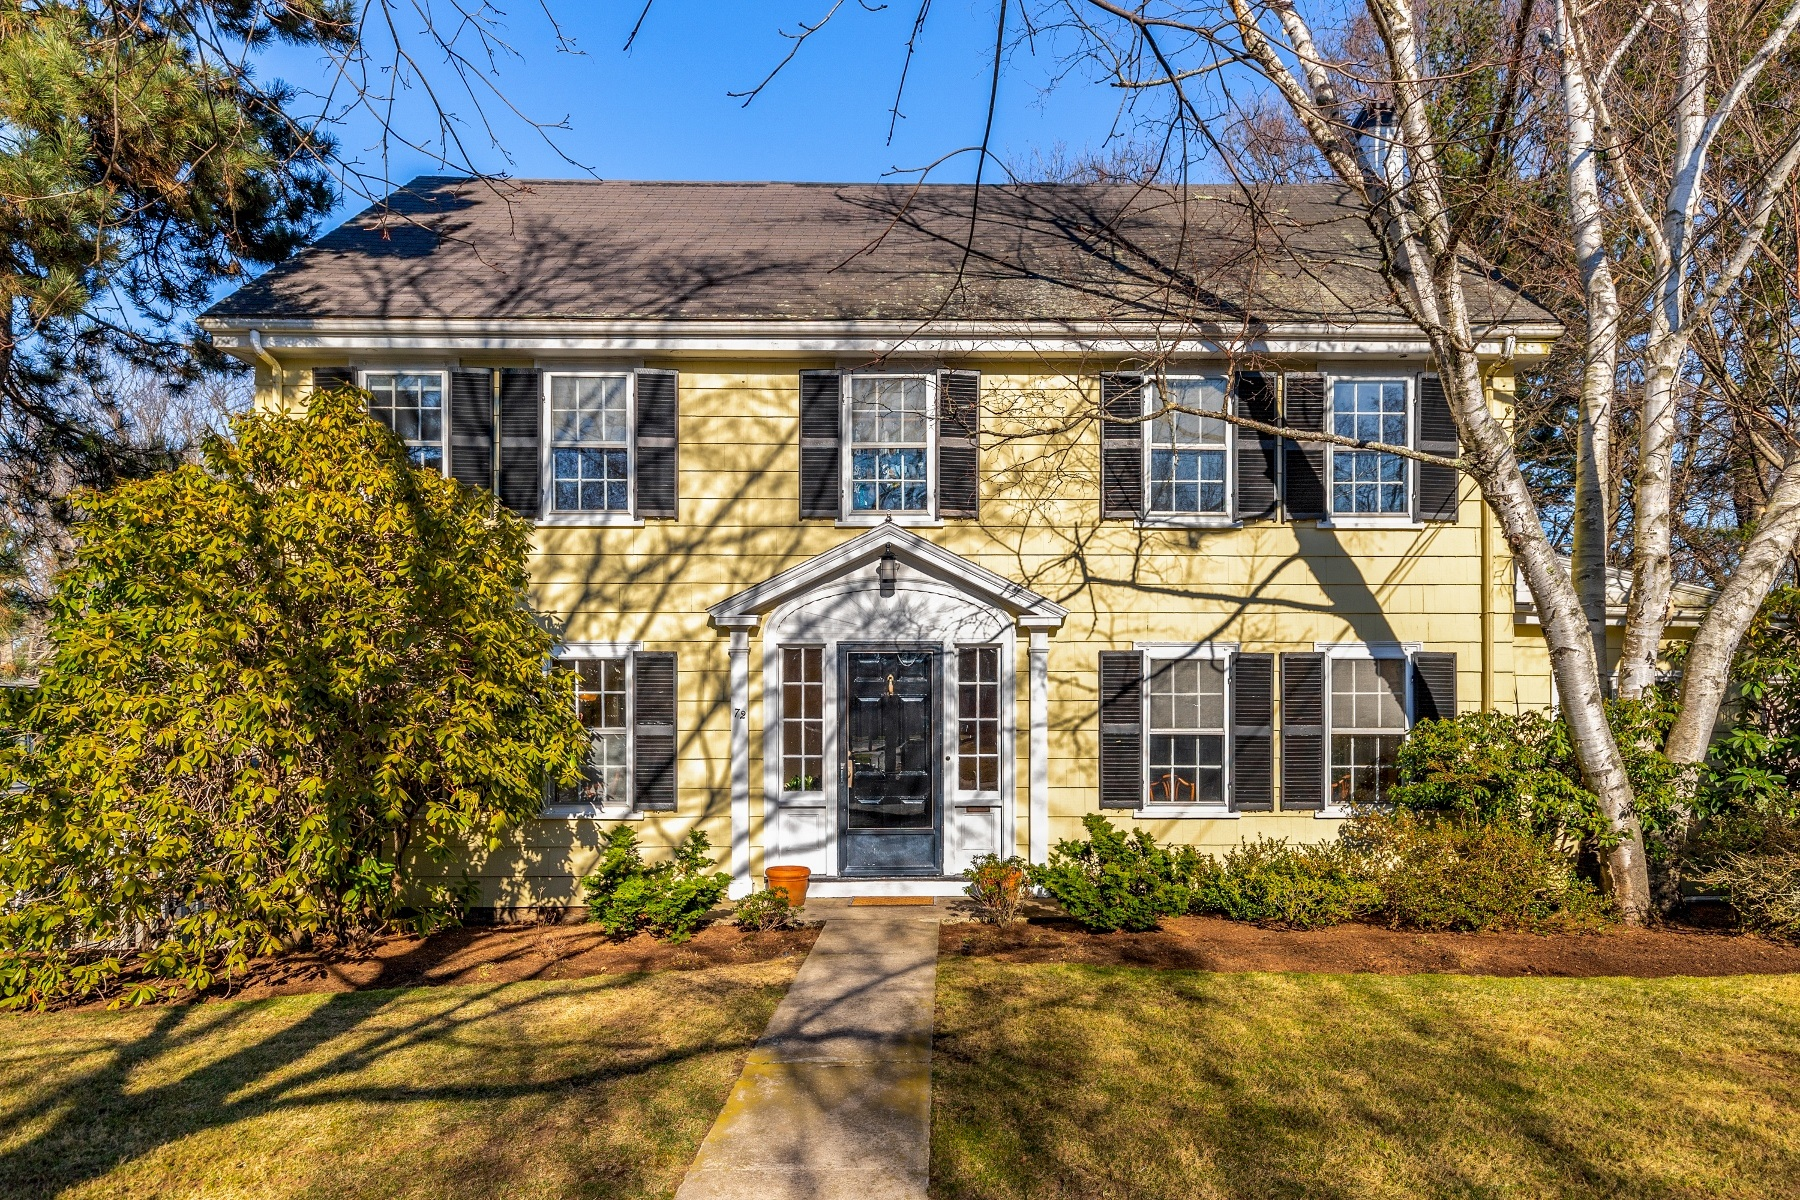 Single Family Home for Active at Remarkable Opportunity 72 Bradlee Avenue Swampscott, Massachusetts 01907 United States